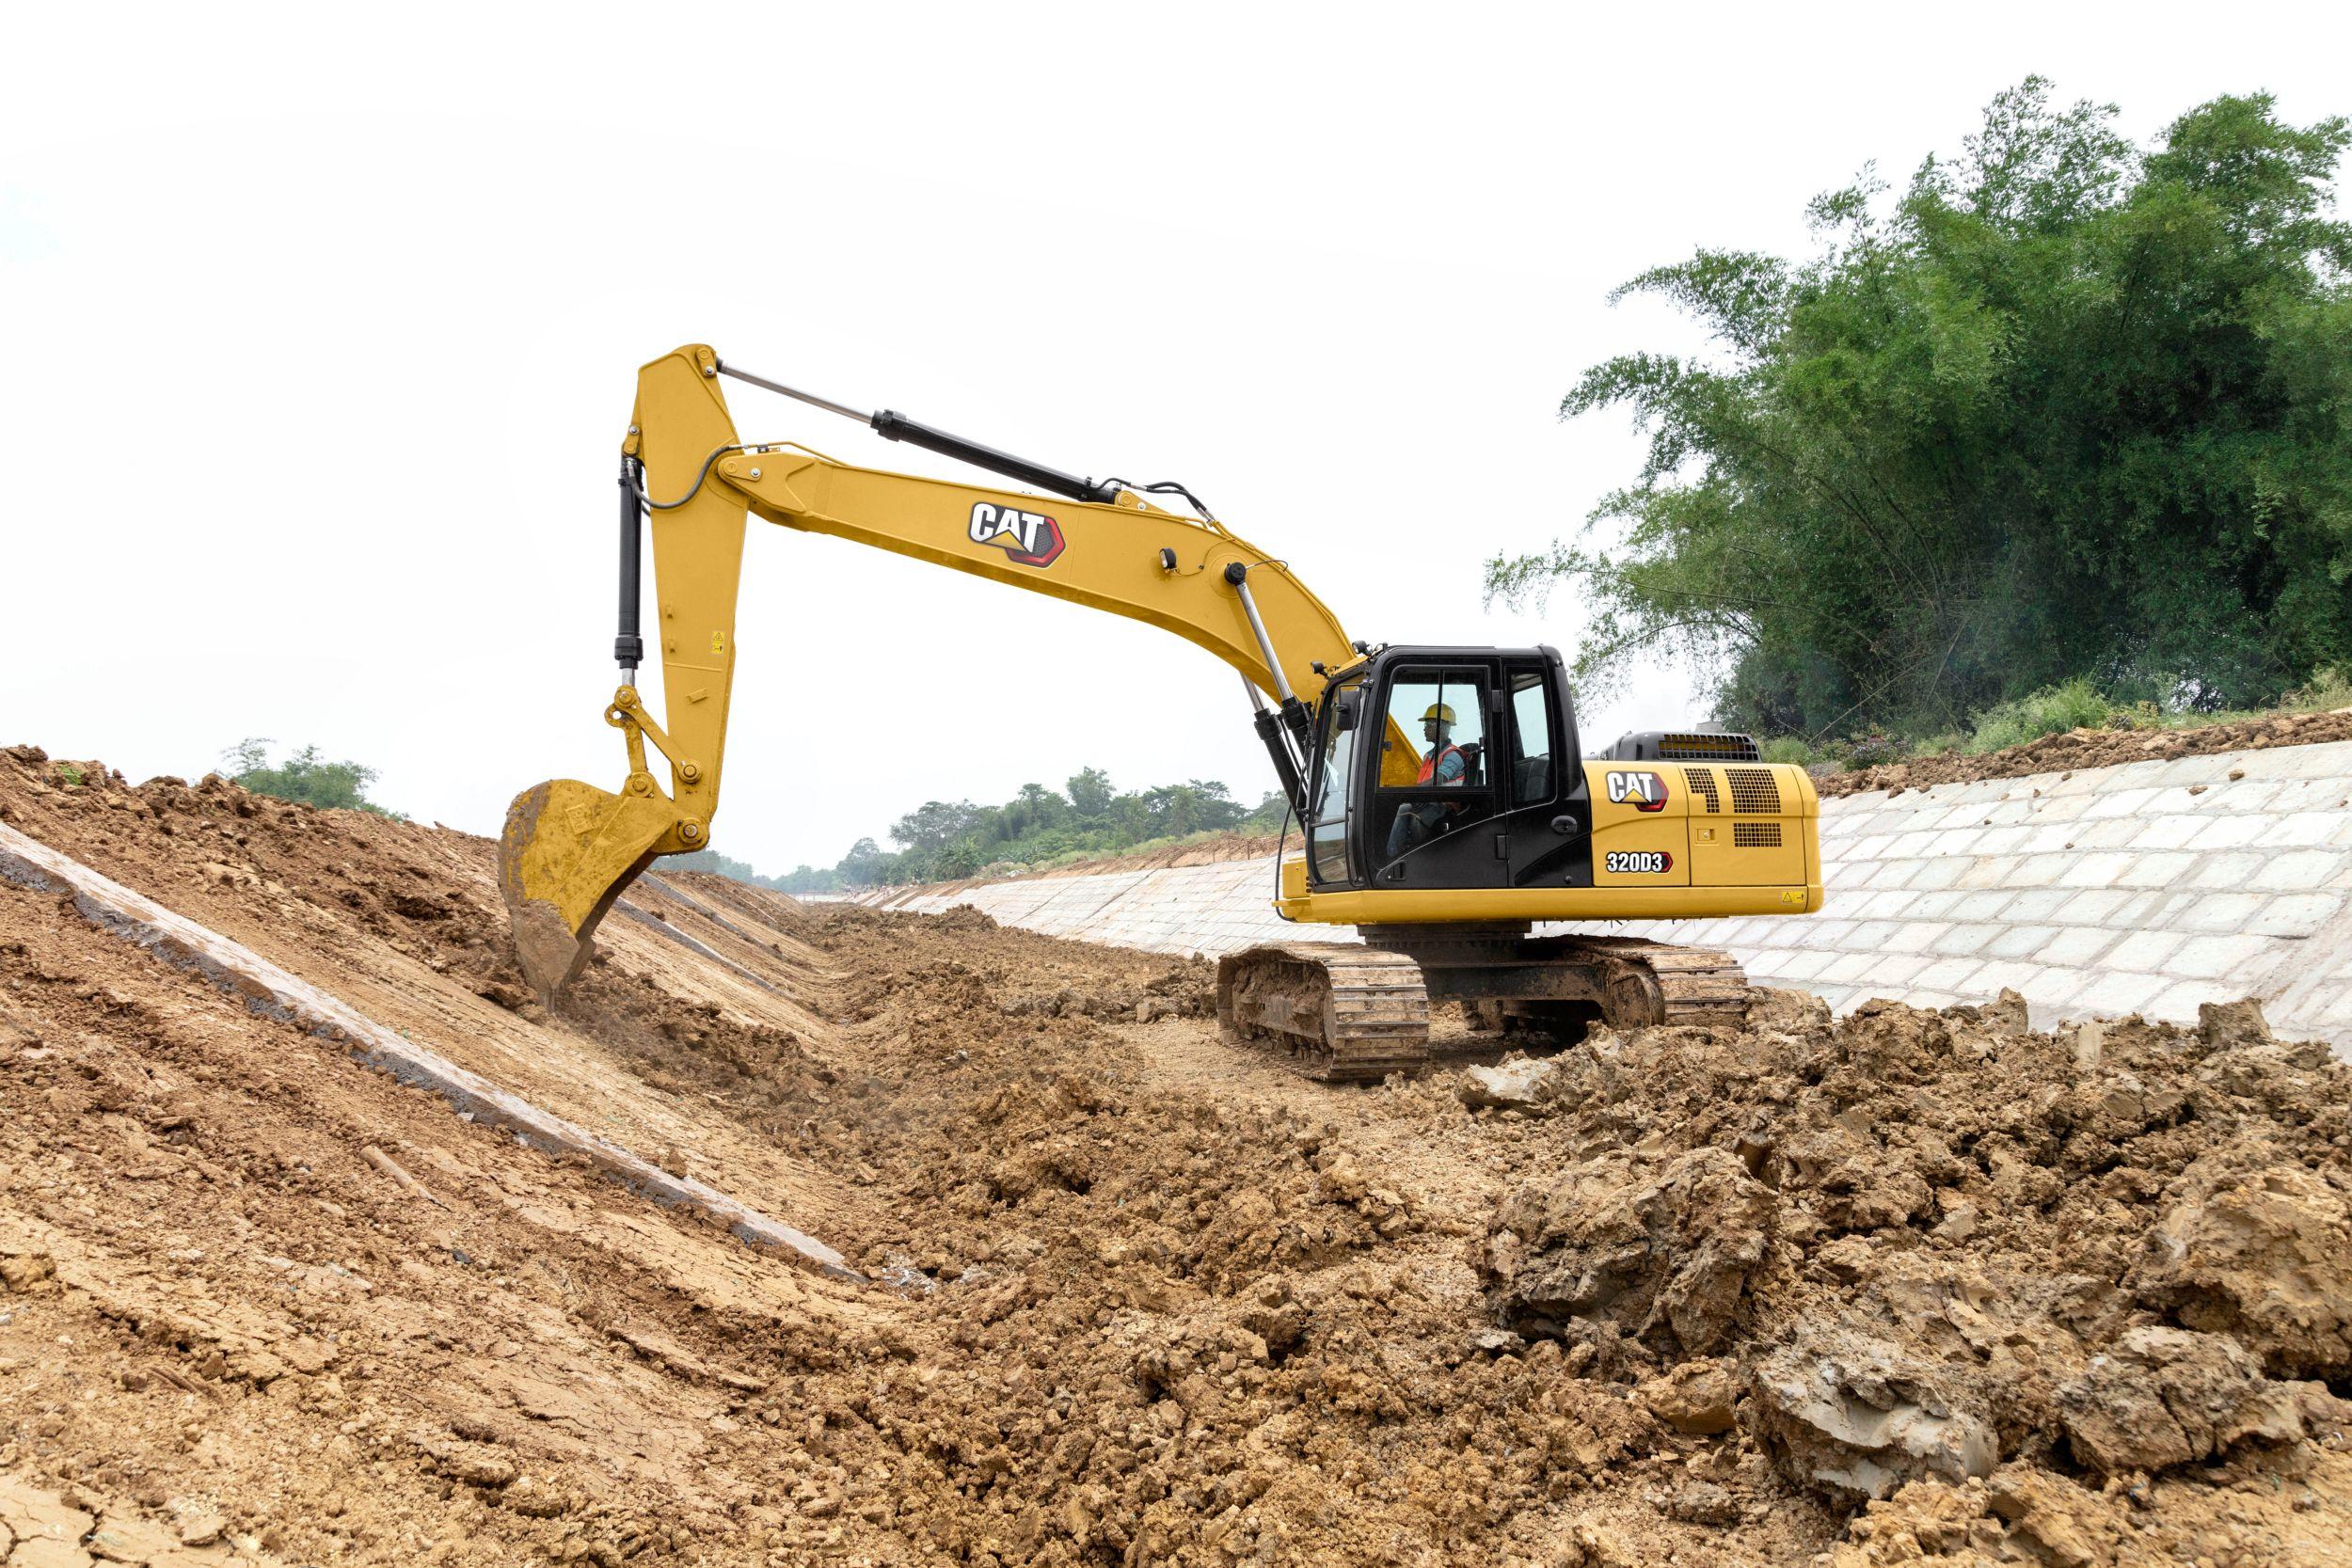 320D3 excavators